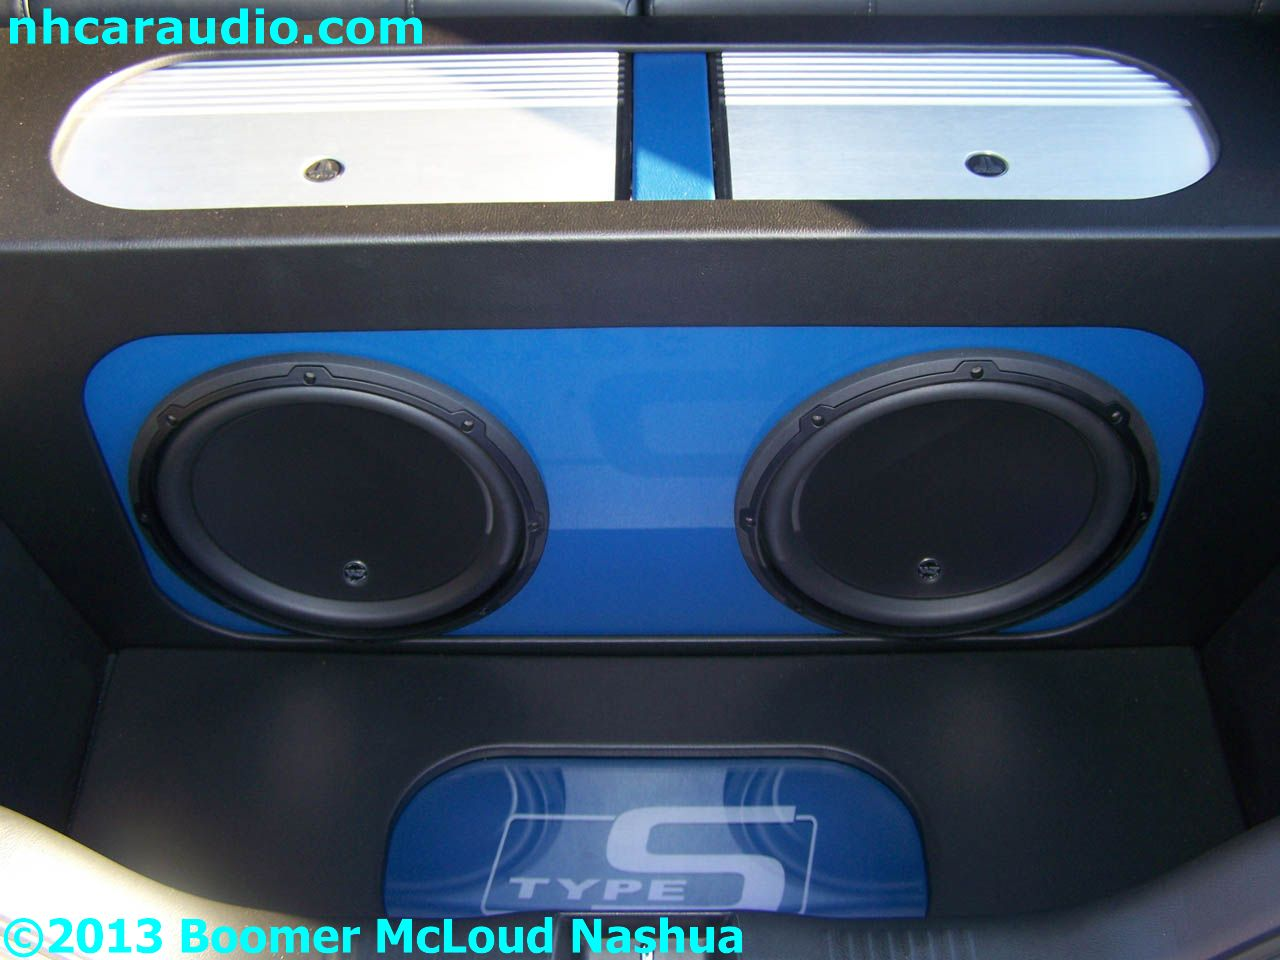 Acura-RSX-custom-subwoofer-enclosure-amplifier - Boomer Nashua Mobile Electronics